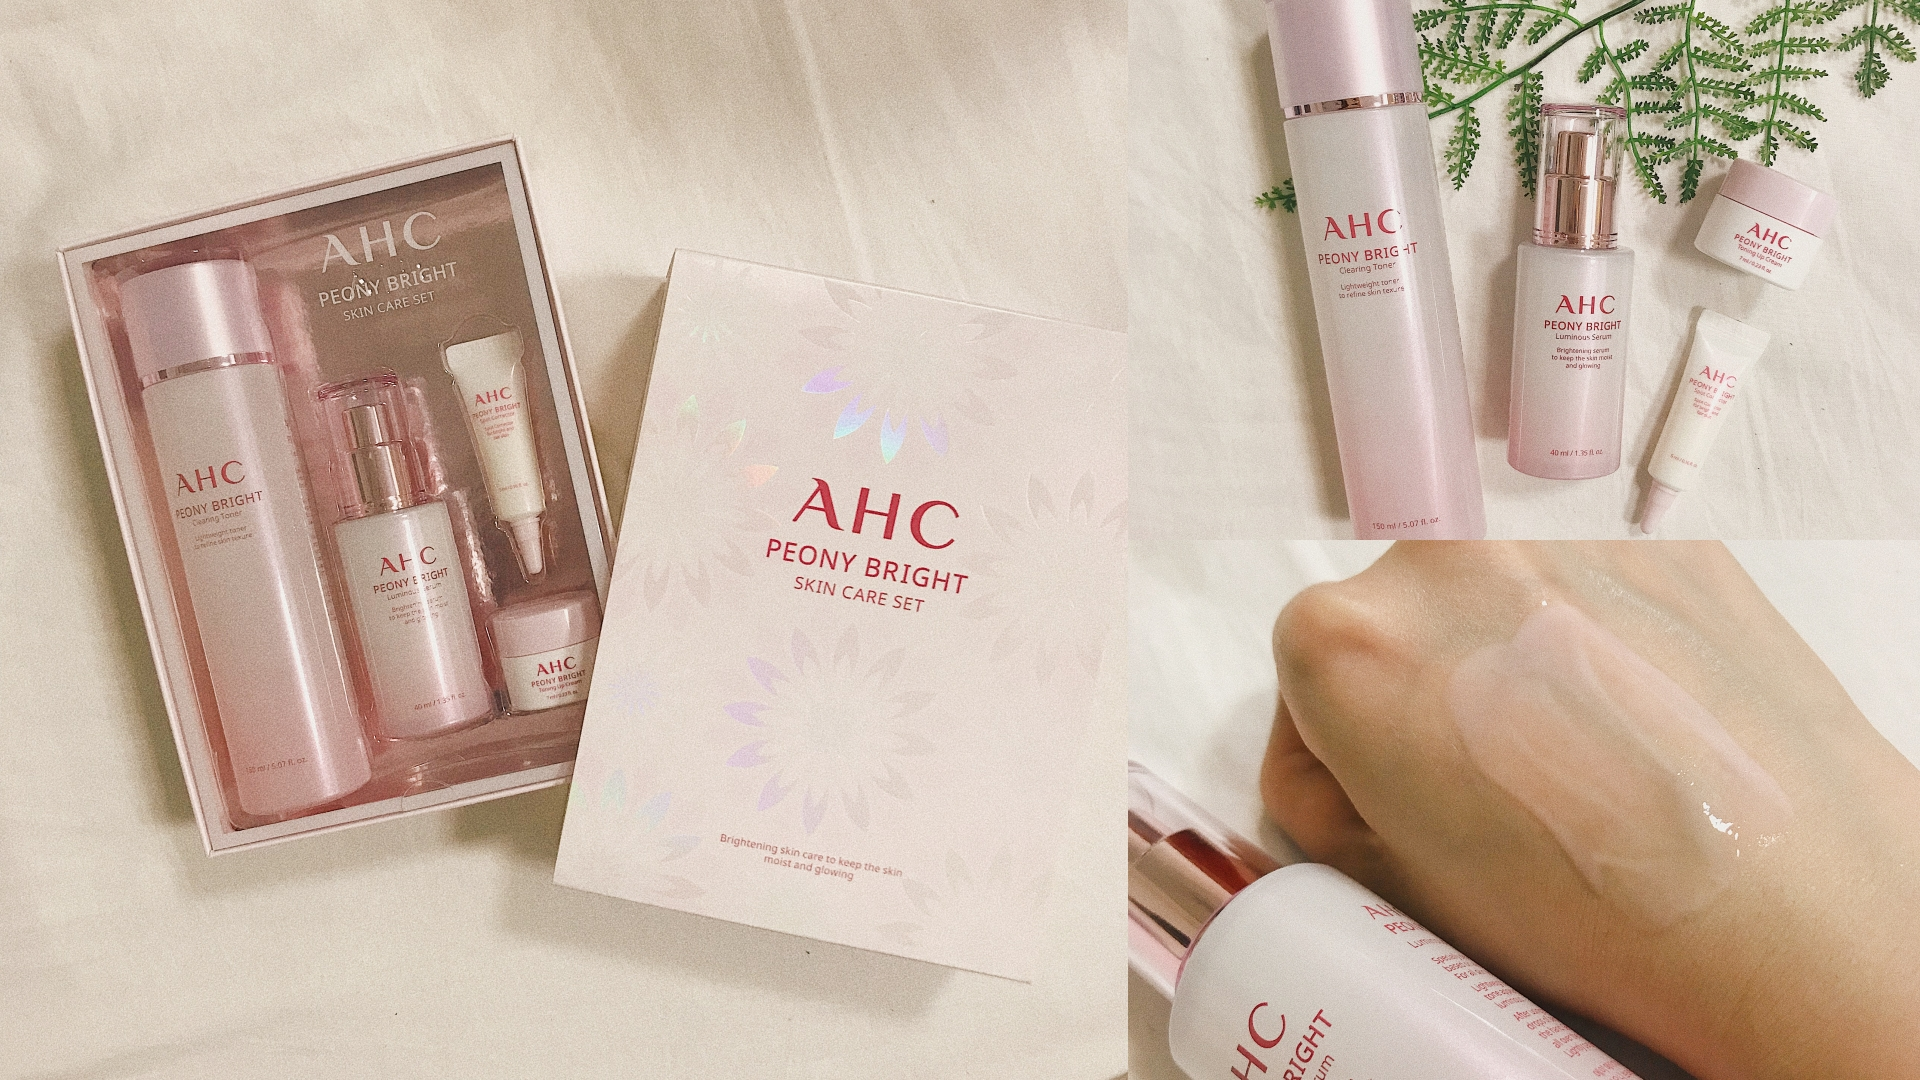 AHC的無瑕煥白系列,針對暗沉疲憊肌膚設計,裡面富含高濃度沒骨花精華、亮白因子,能幫助改善暗沉,綻現透亮無瑕肌膚,使用後的滿意度高達95%!